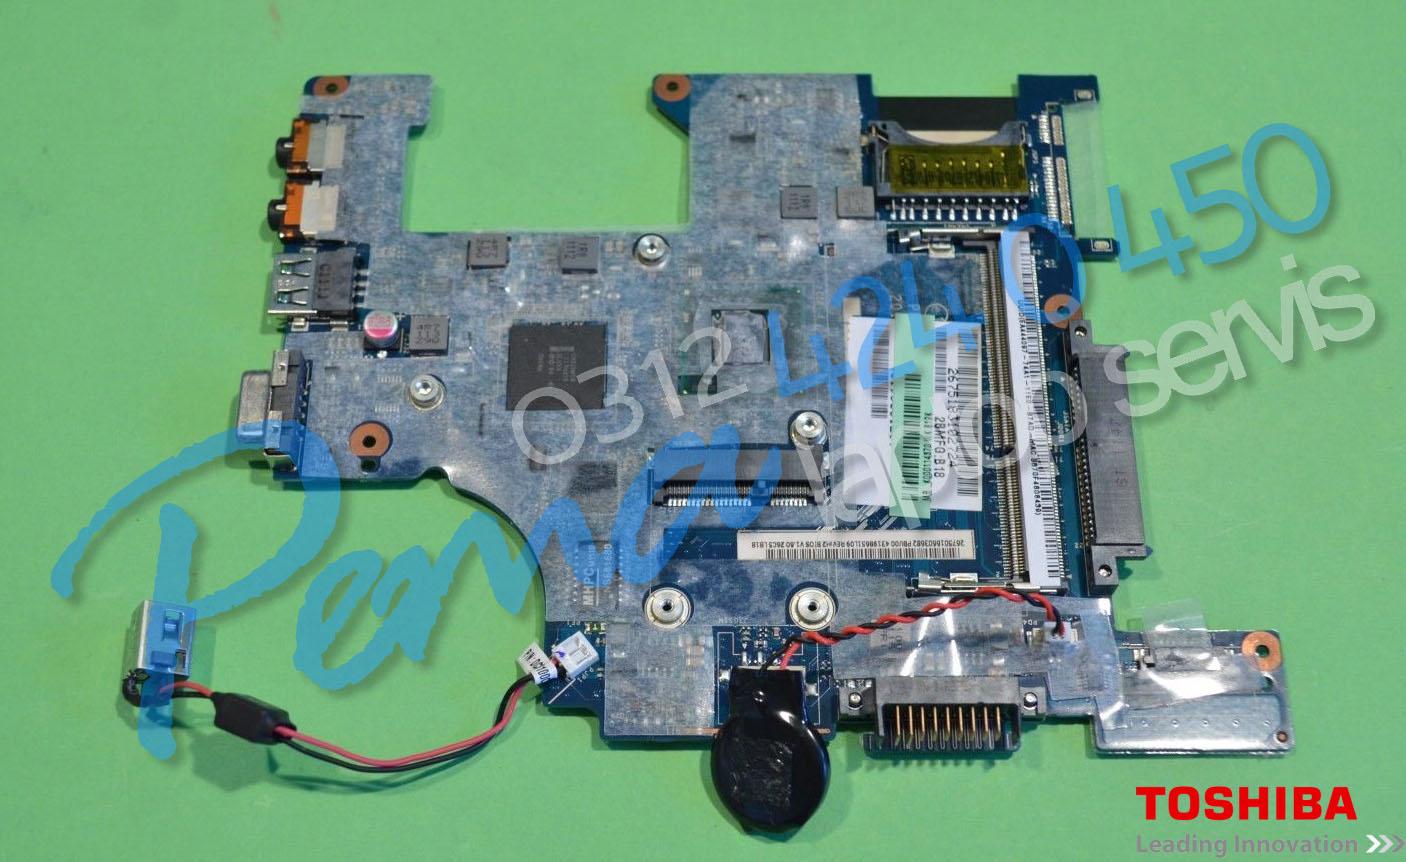 Toshiba NB500 Anakart